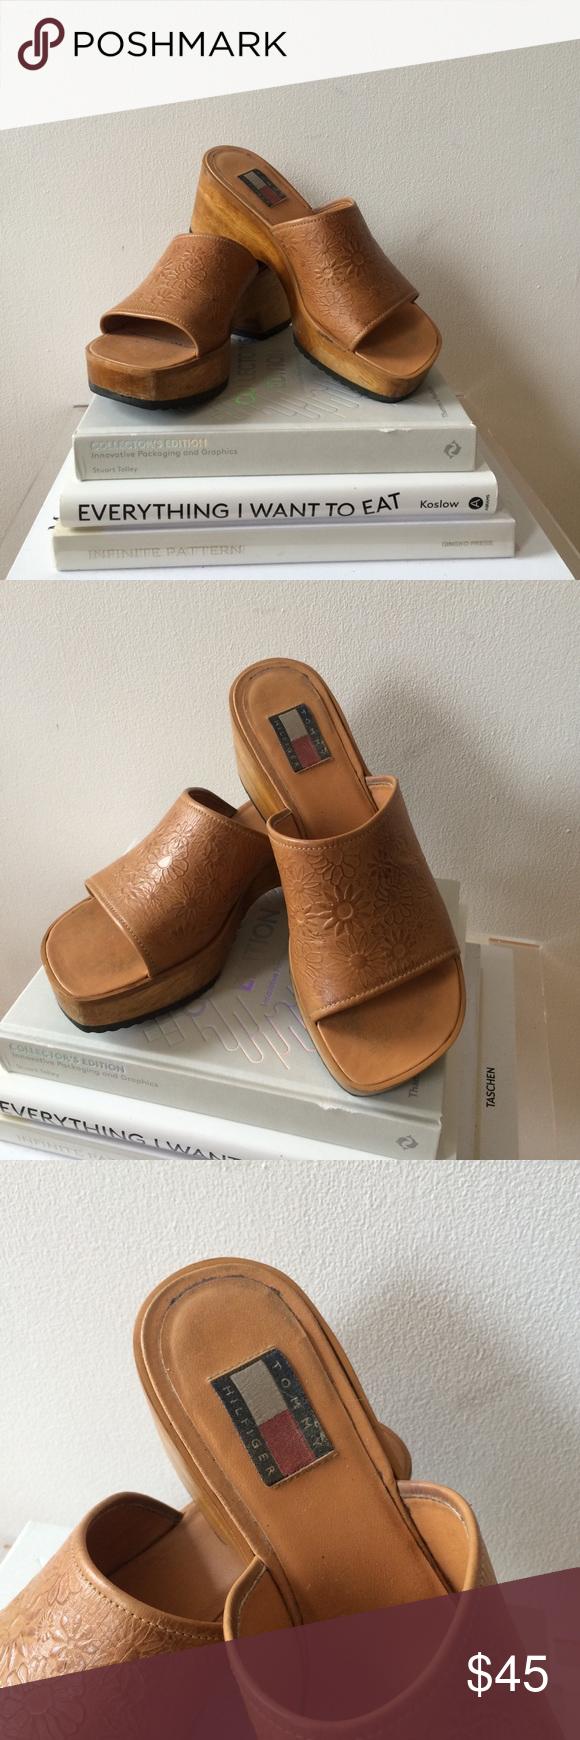 82cbf99c6847a5 Vintage Tommy Hilfiger Clogs AMAZING vintage Tommy Hilfiger clog sandals  with a wooden sole